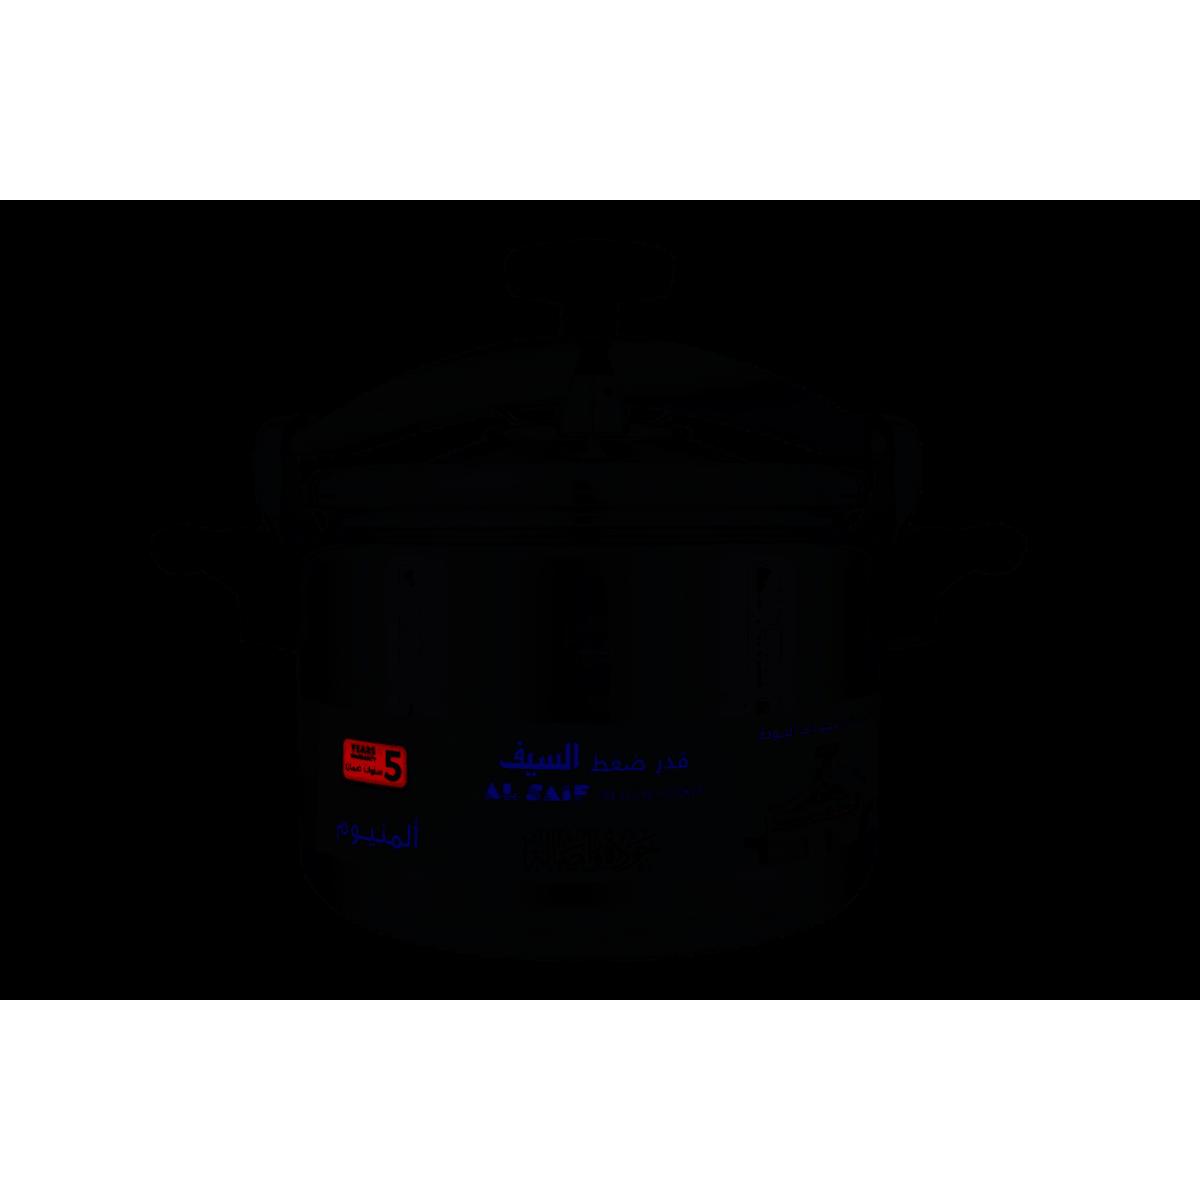 قدر ضغط المنيوم  السيف - 10 لتر  رقم k990010/10L